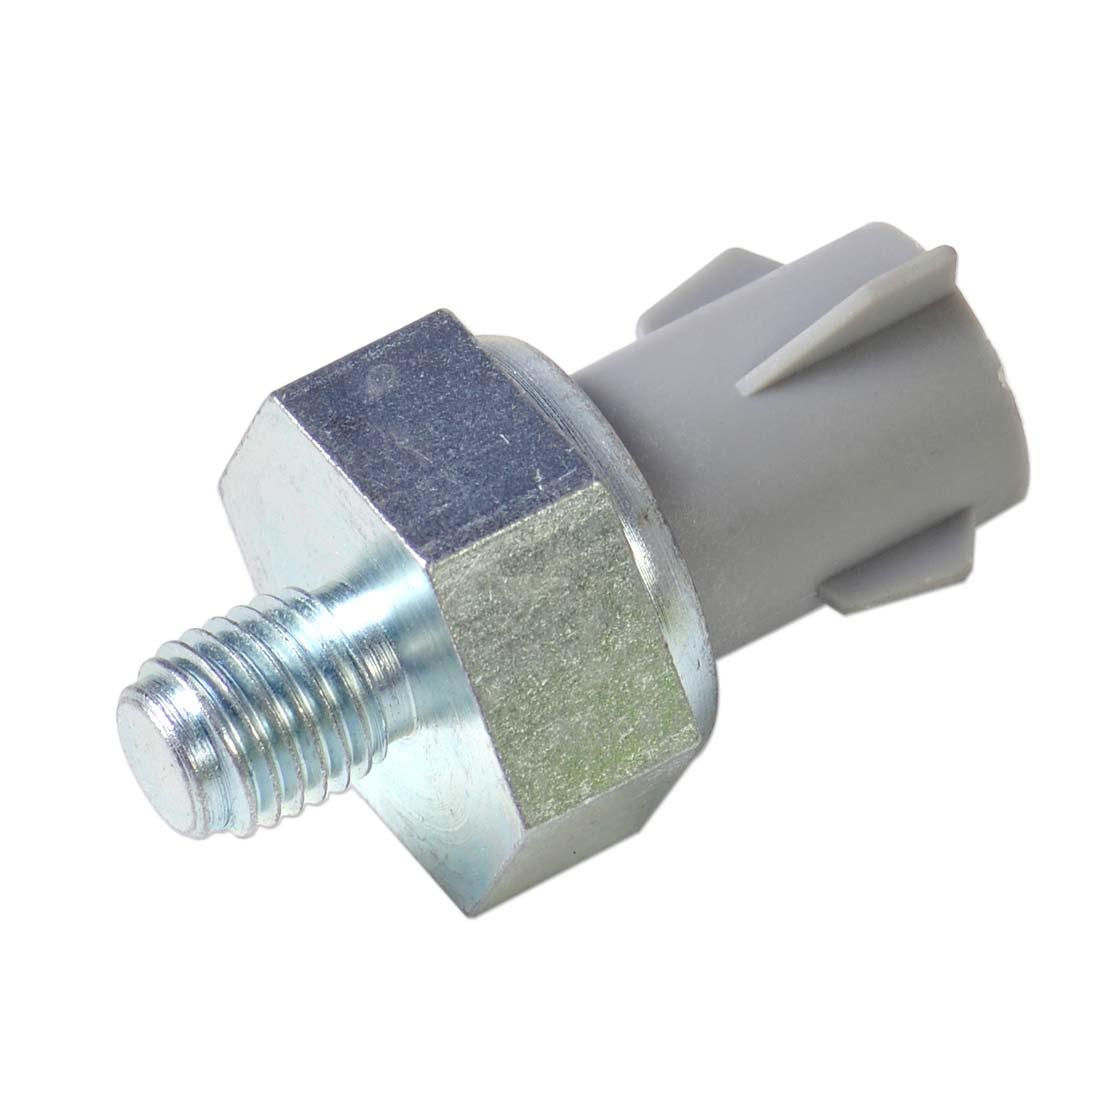 Knock Sensor For Ford Lincoln E-250 F-150 Replace 94DA-12A699-AA F3LY12A699A